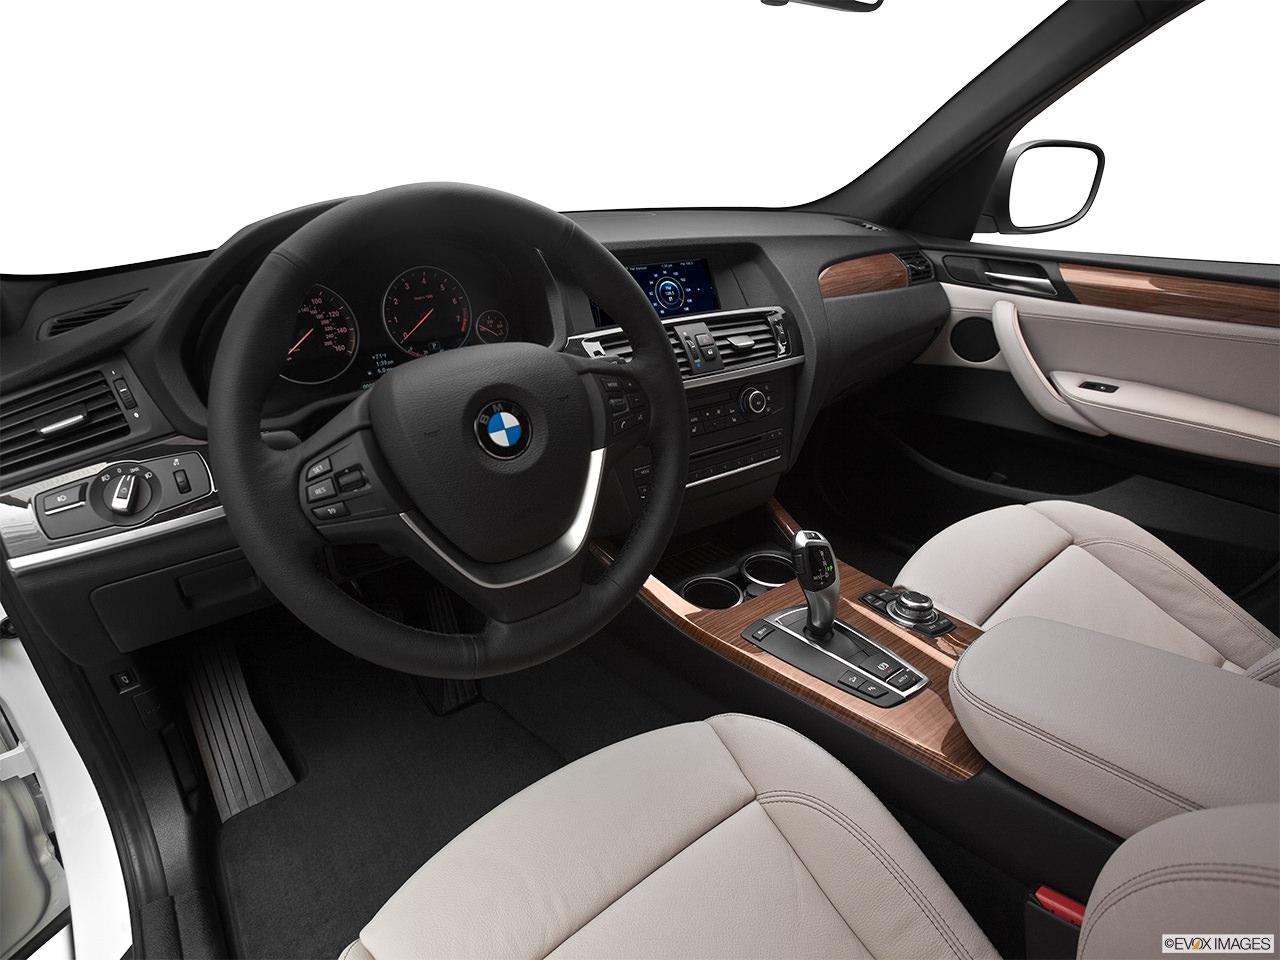 BMW X5 2012 Interior